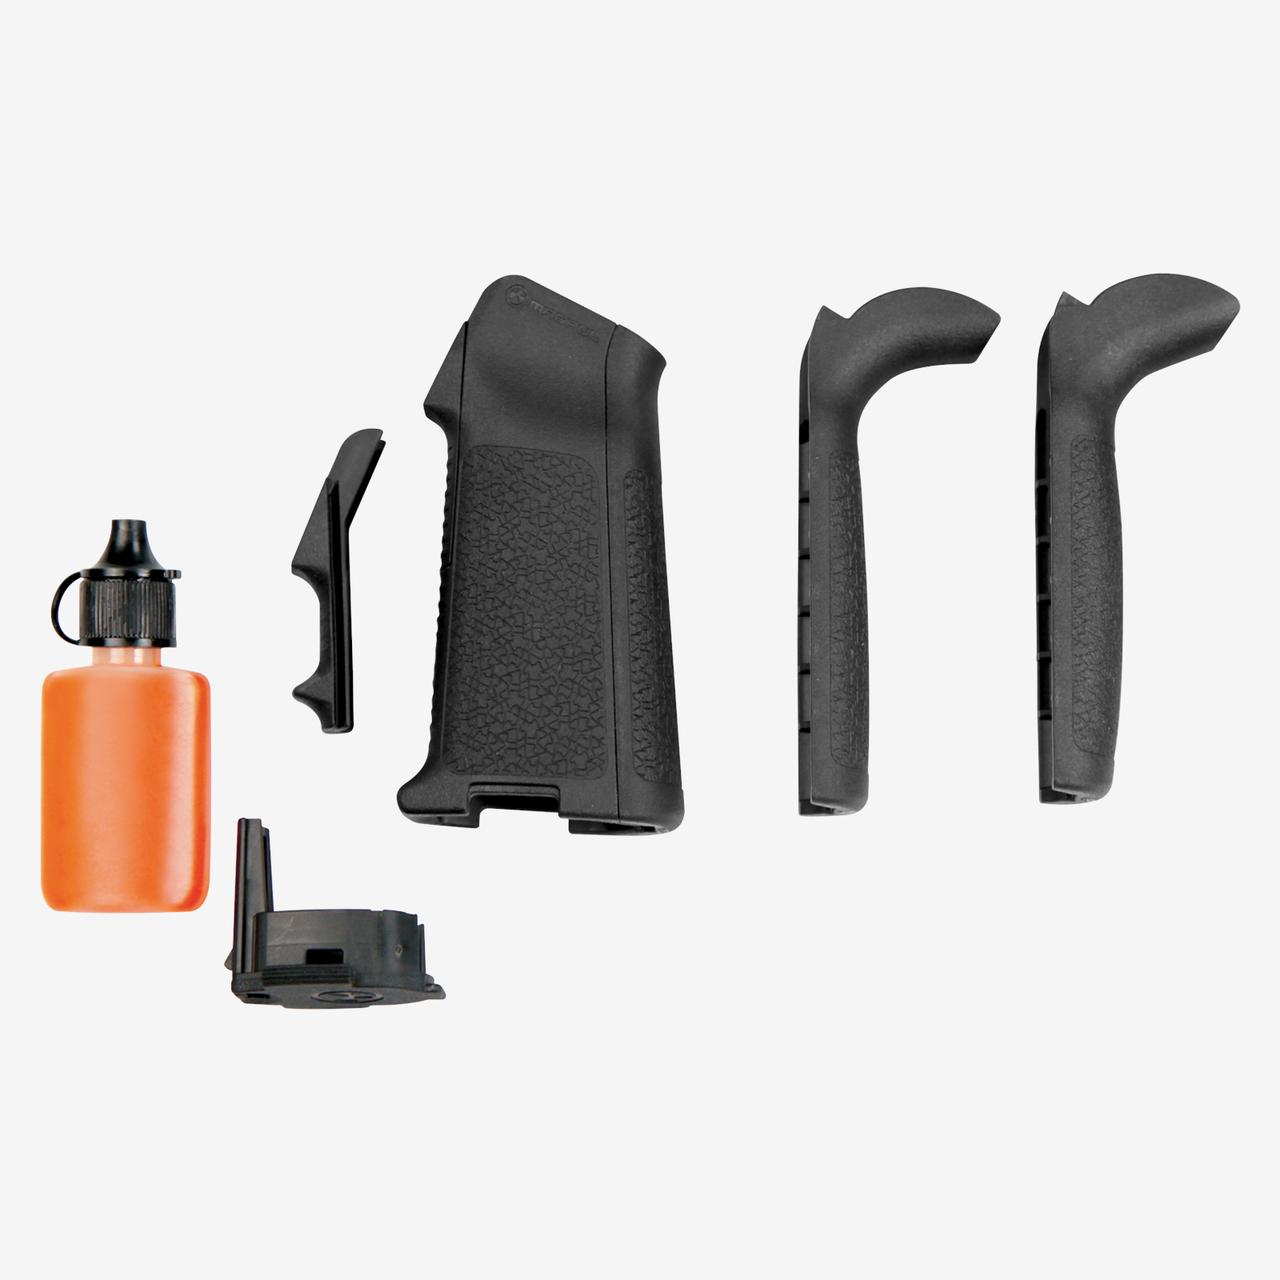 MIAD® GEN 1.1 Grip Kit – TYPE 1